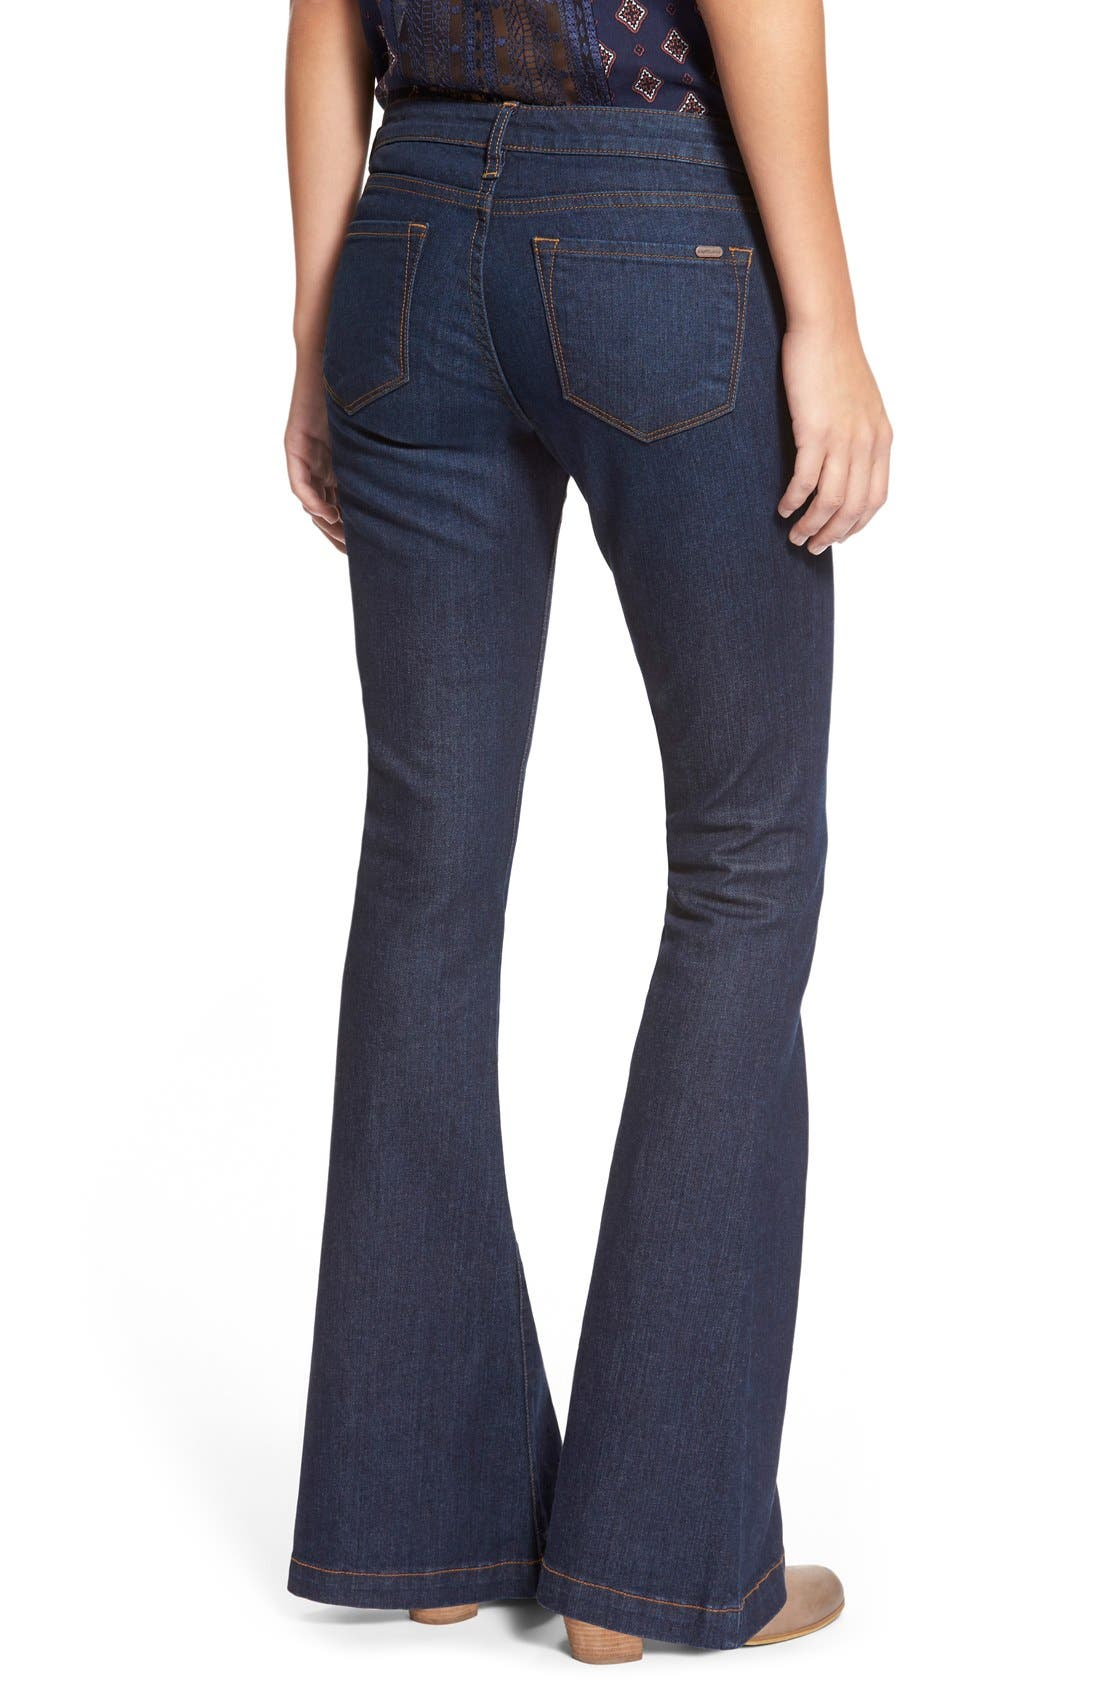 Alternate Image 2  - STSBlue 'Nikki' Flare Leg Skinny Jeans (Napa)